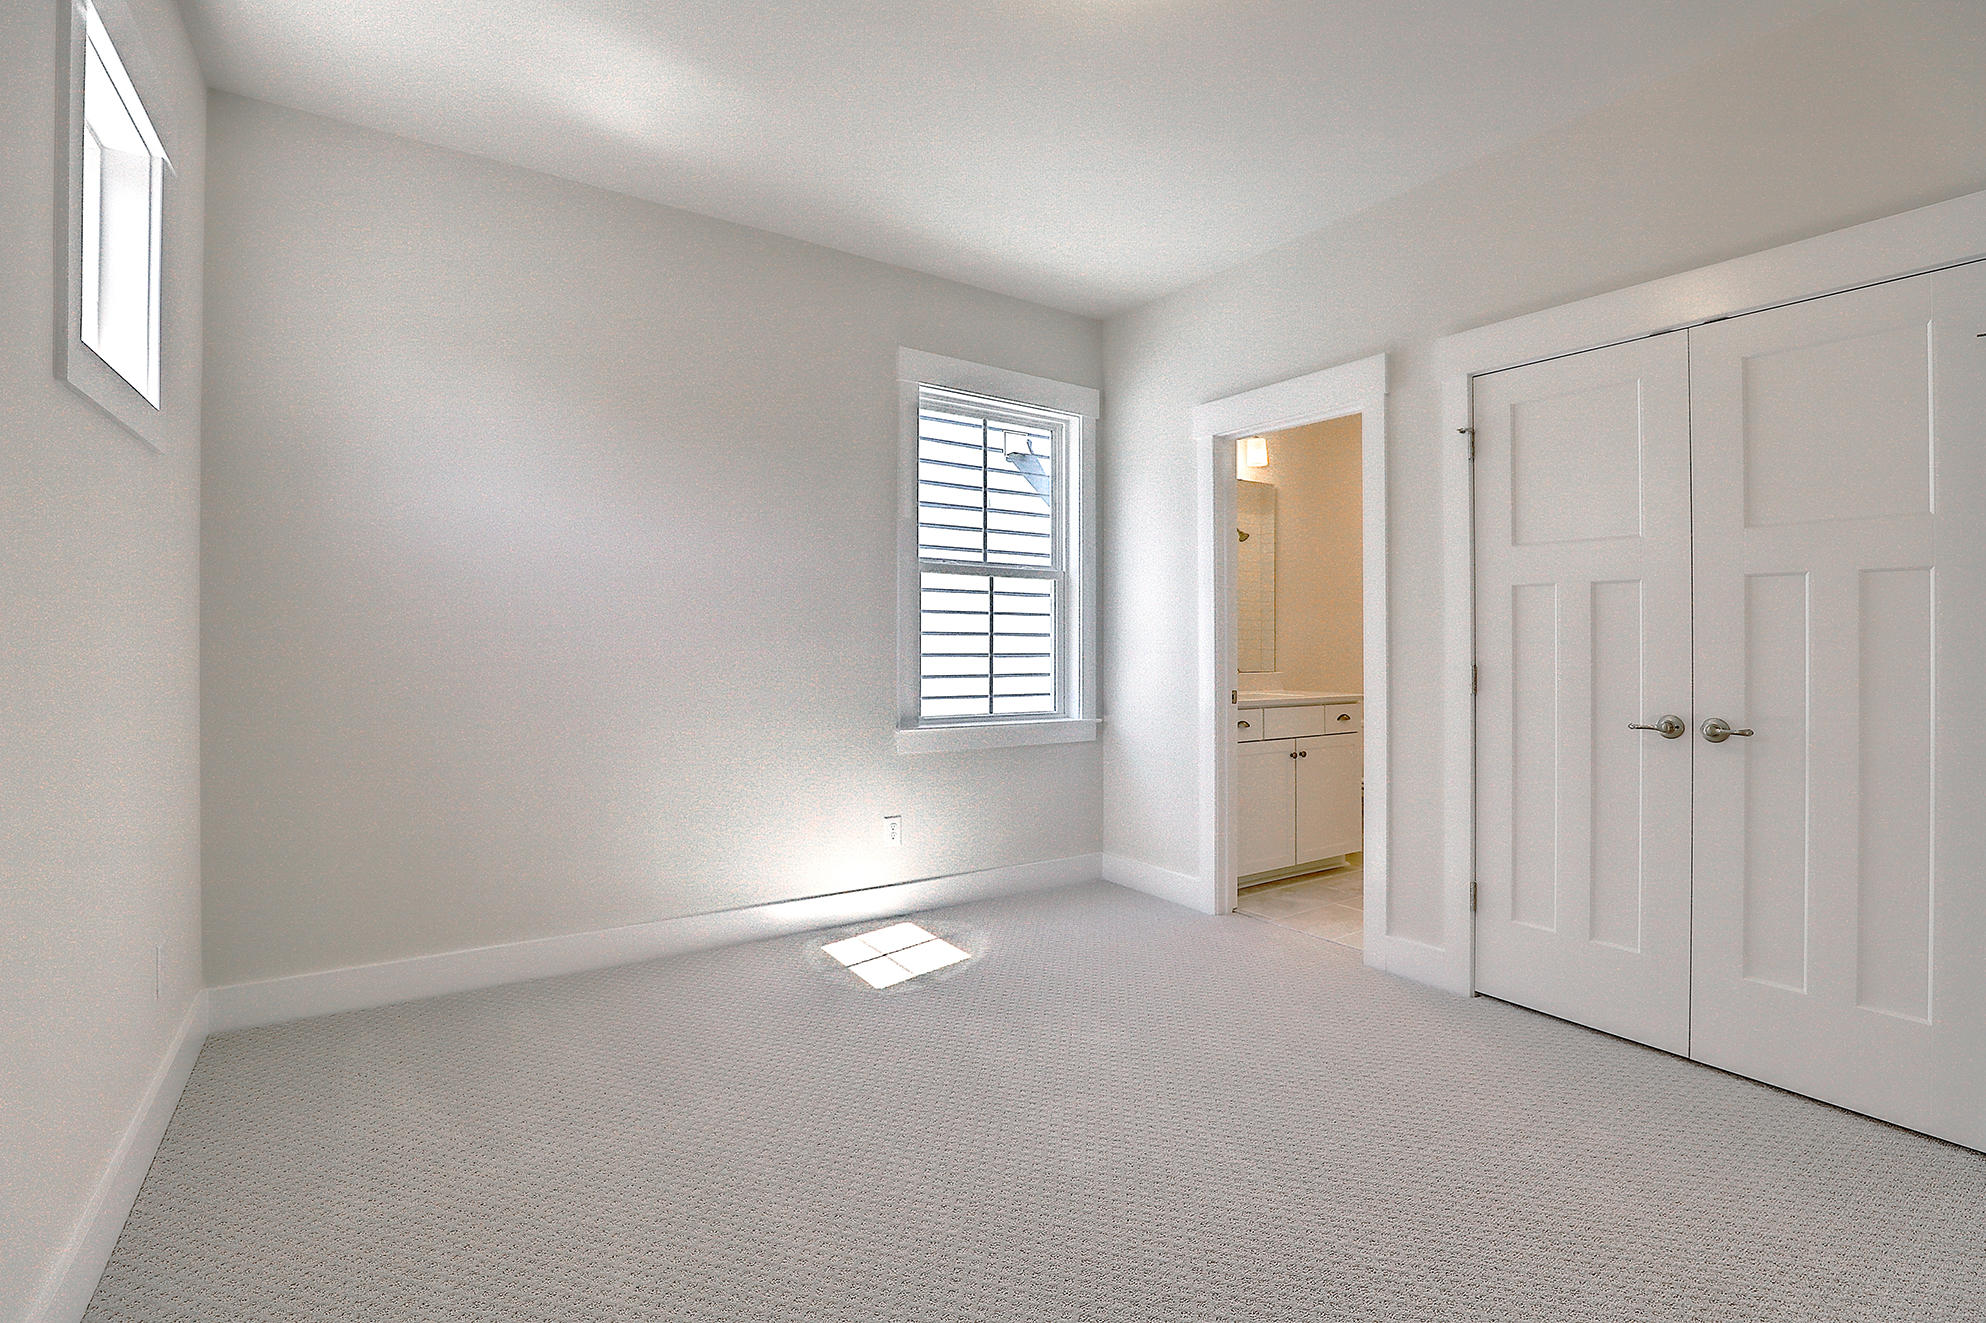 Bentley Park Homes For Sale - 1218 Gannett, Mount Pleasant, SC - 9